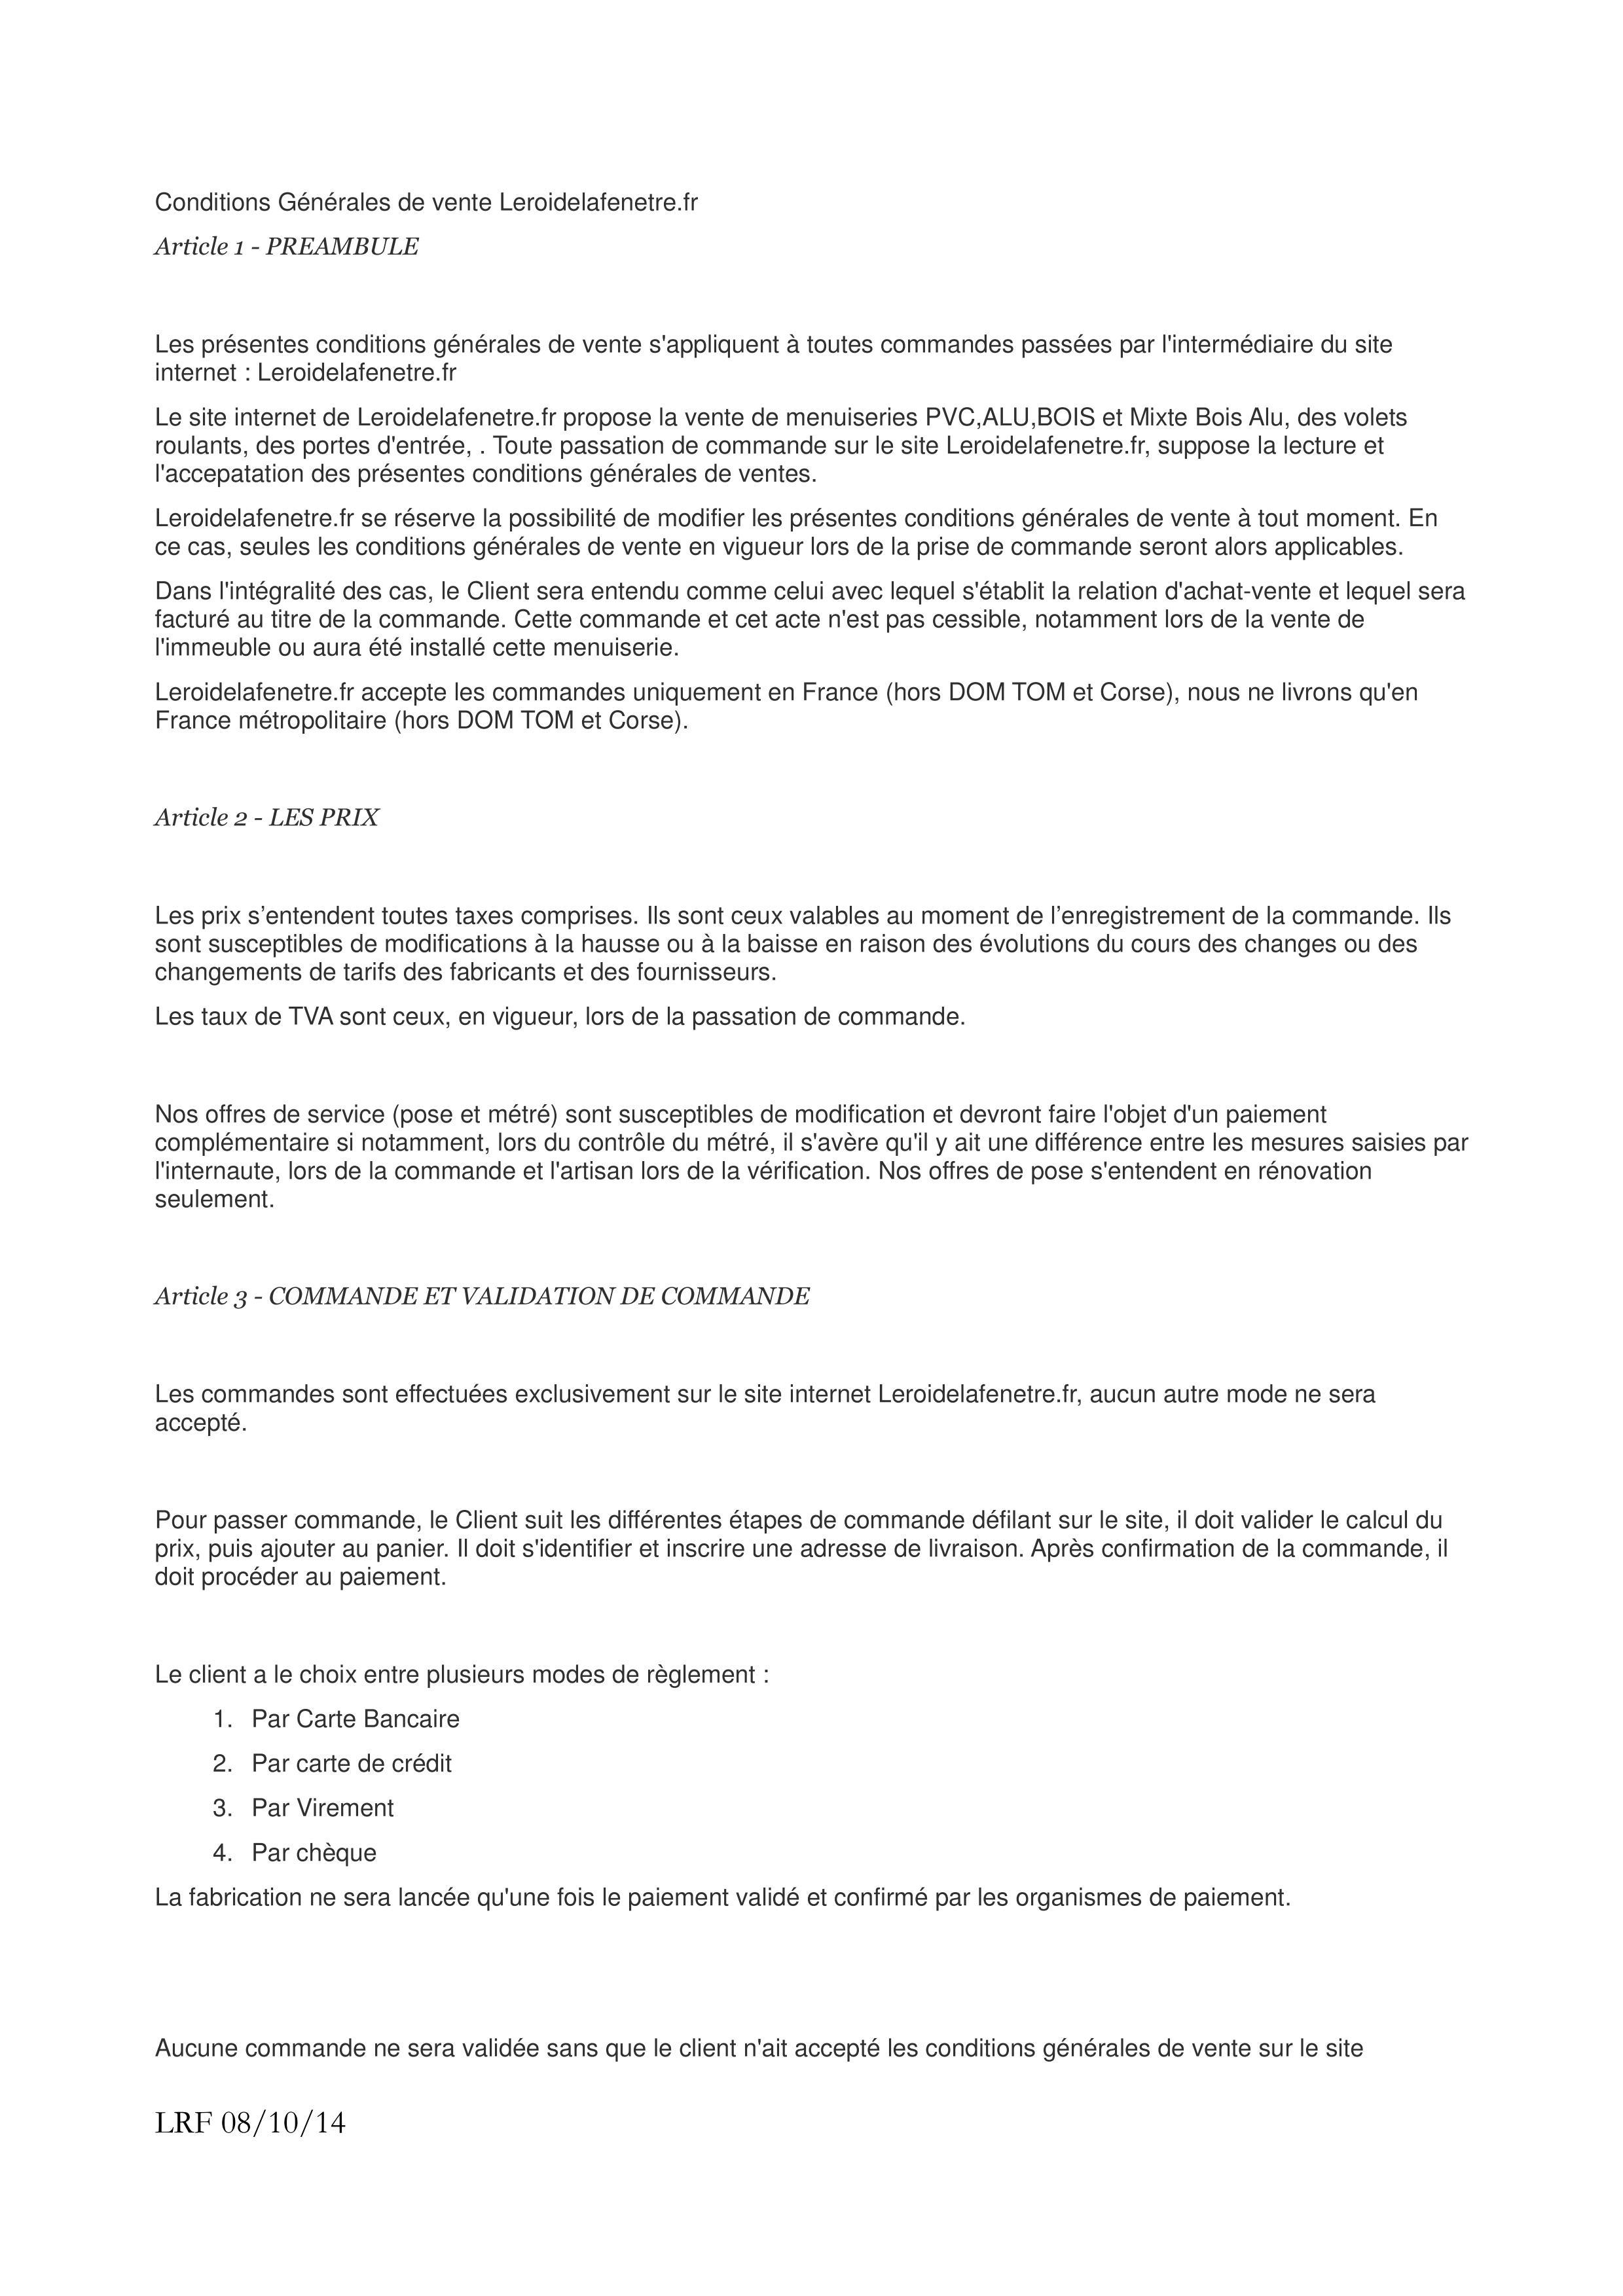 Conditions Generales De Vente Leroidelafenetre Fr